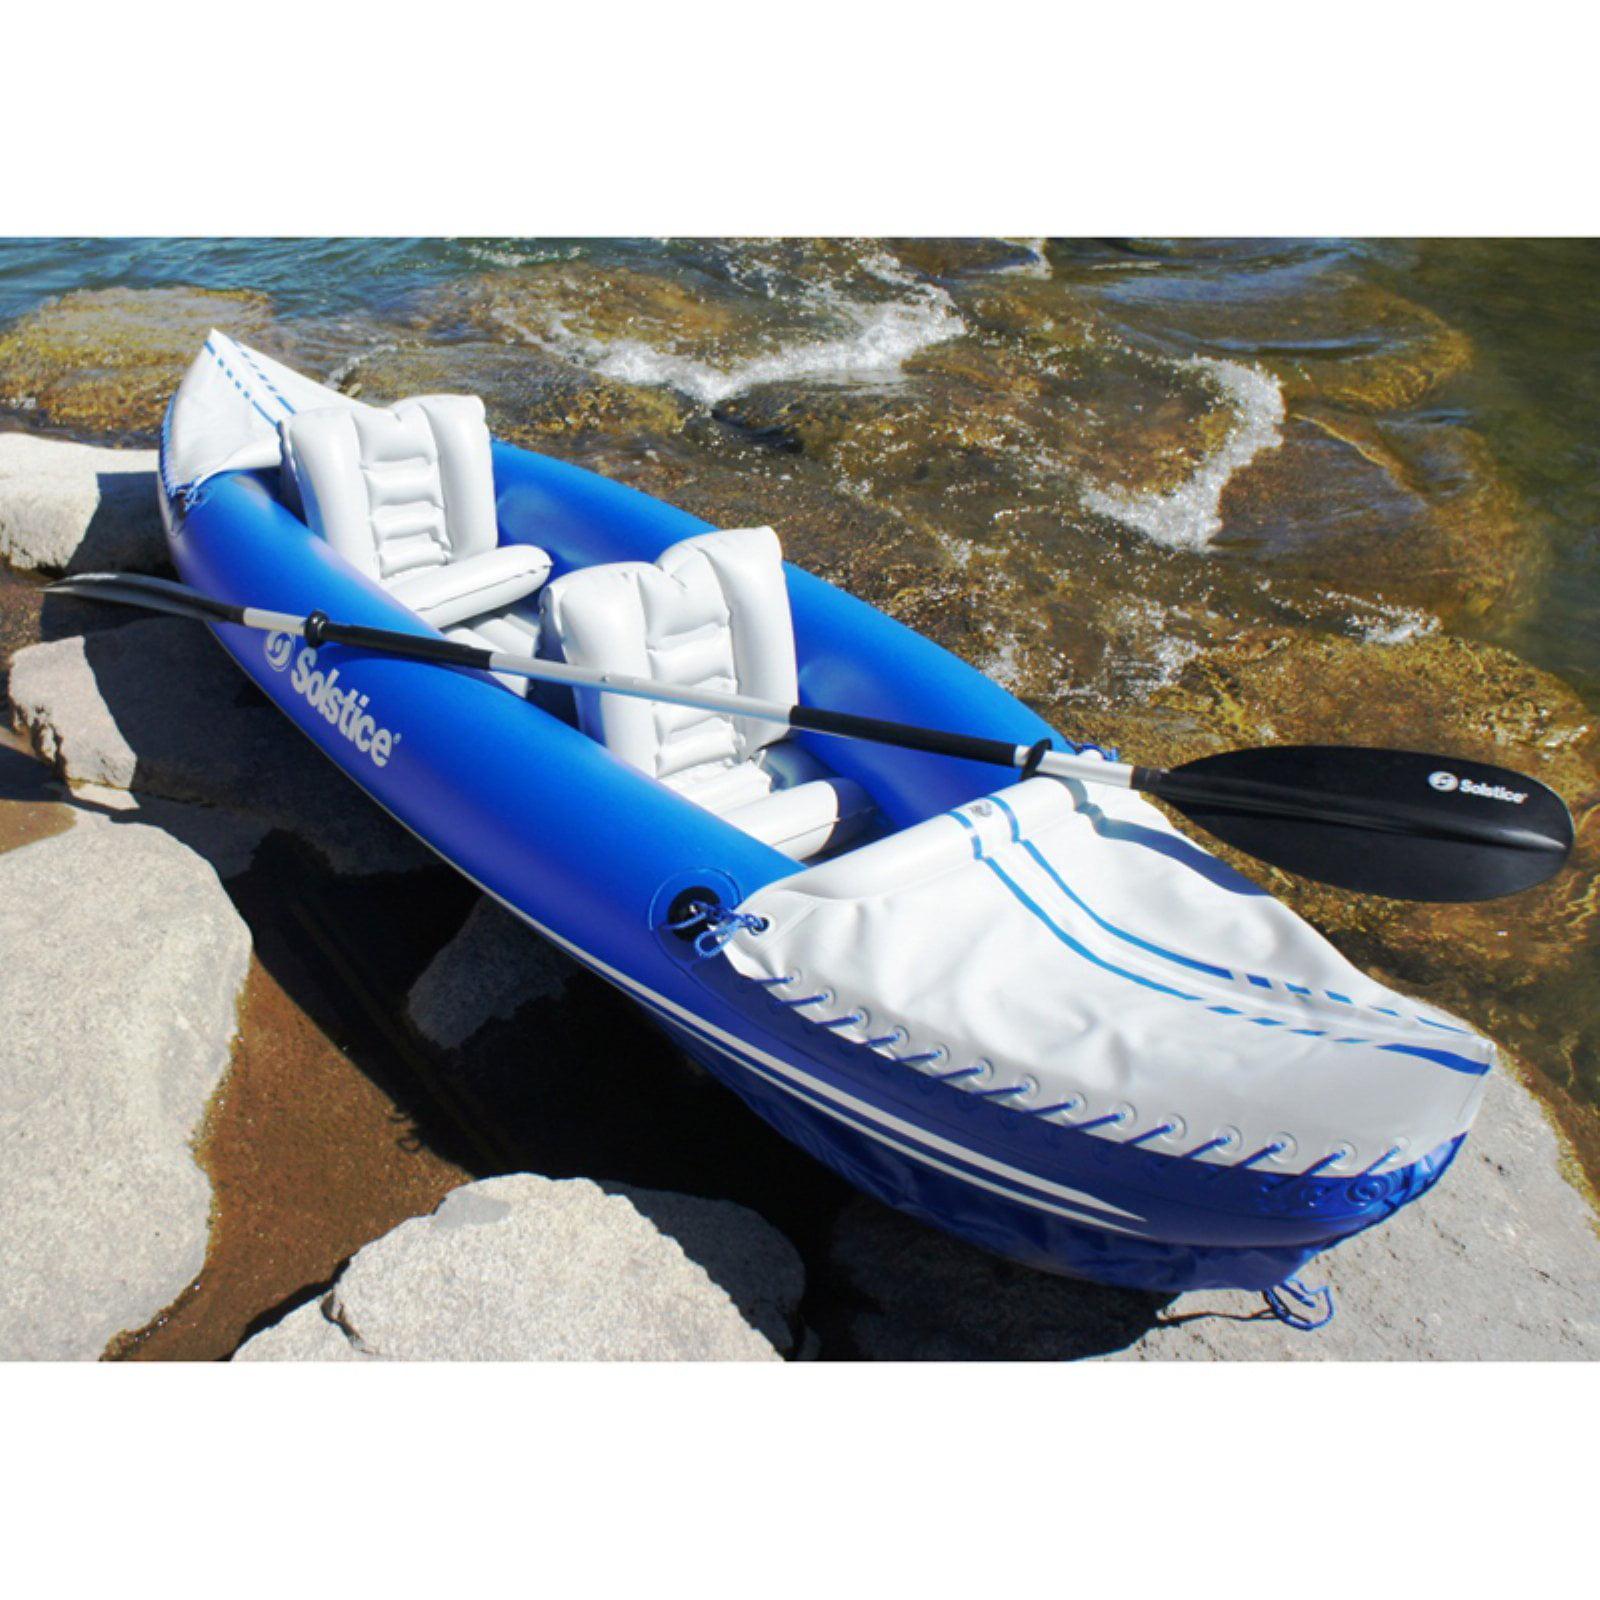 Solstice Rogue Kayak by International Leisure